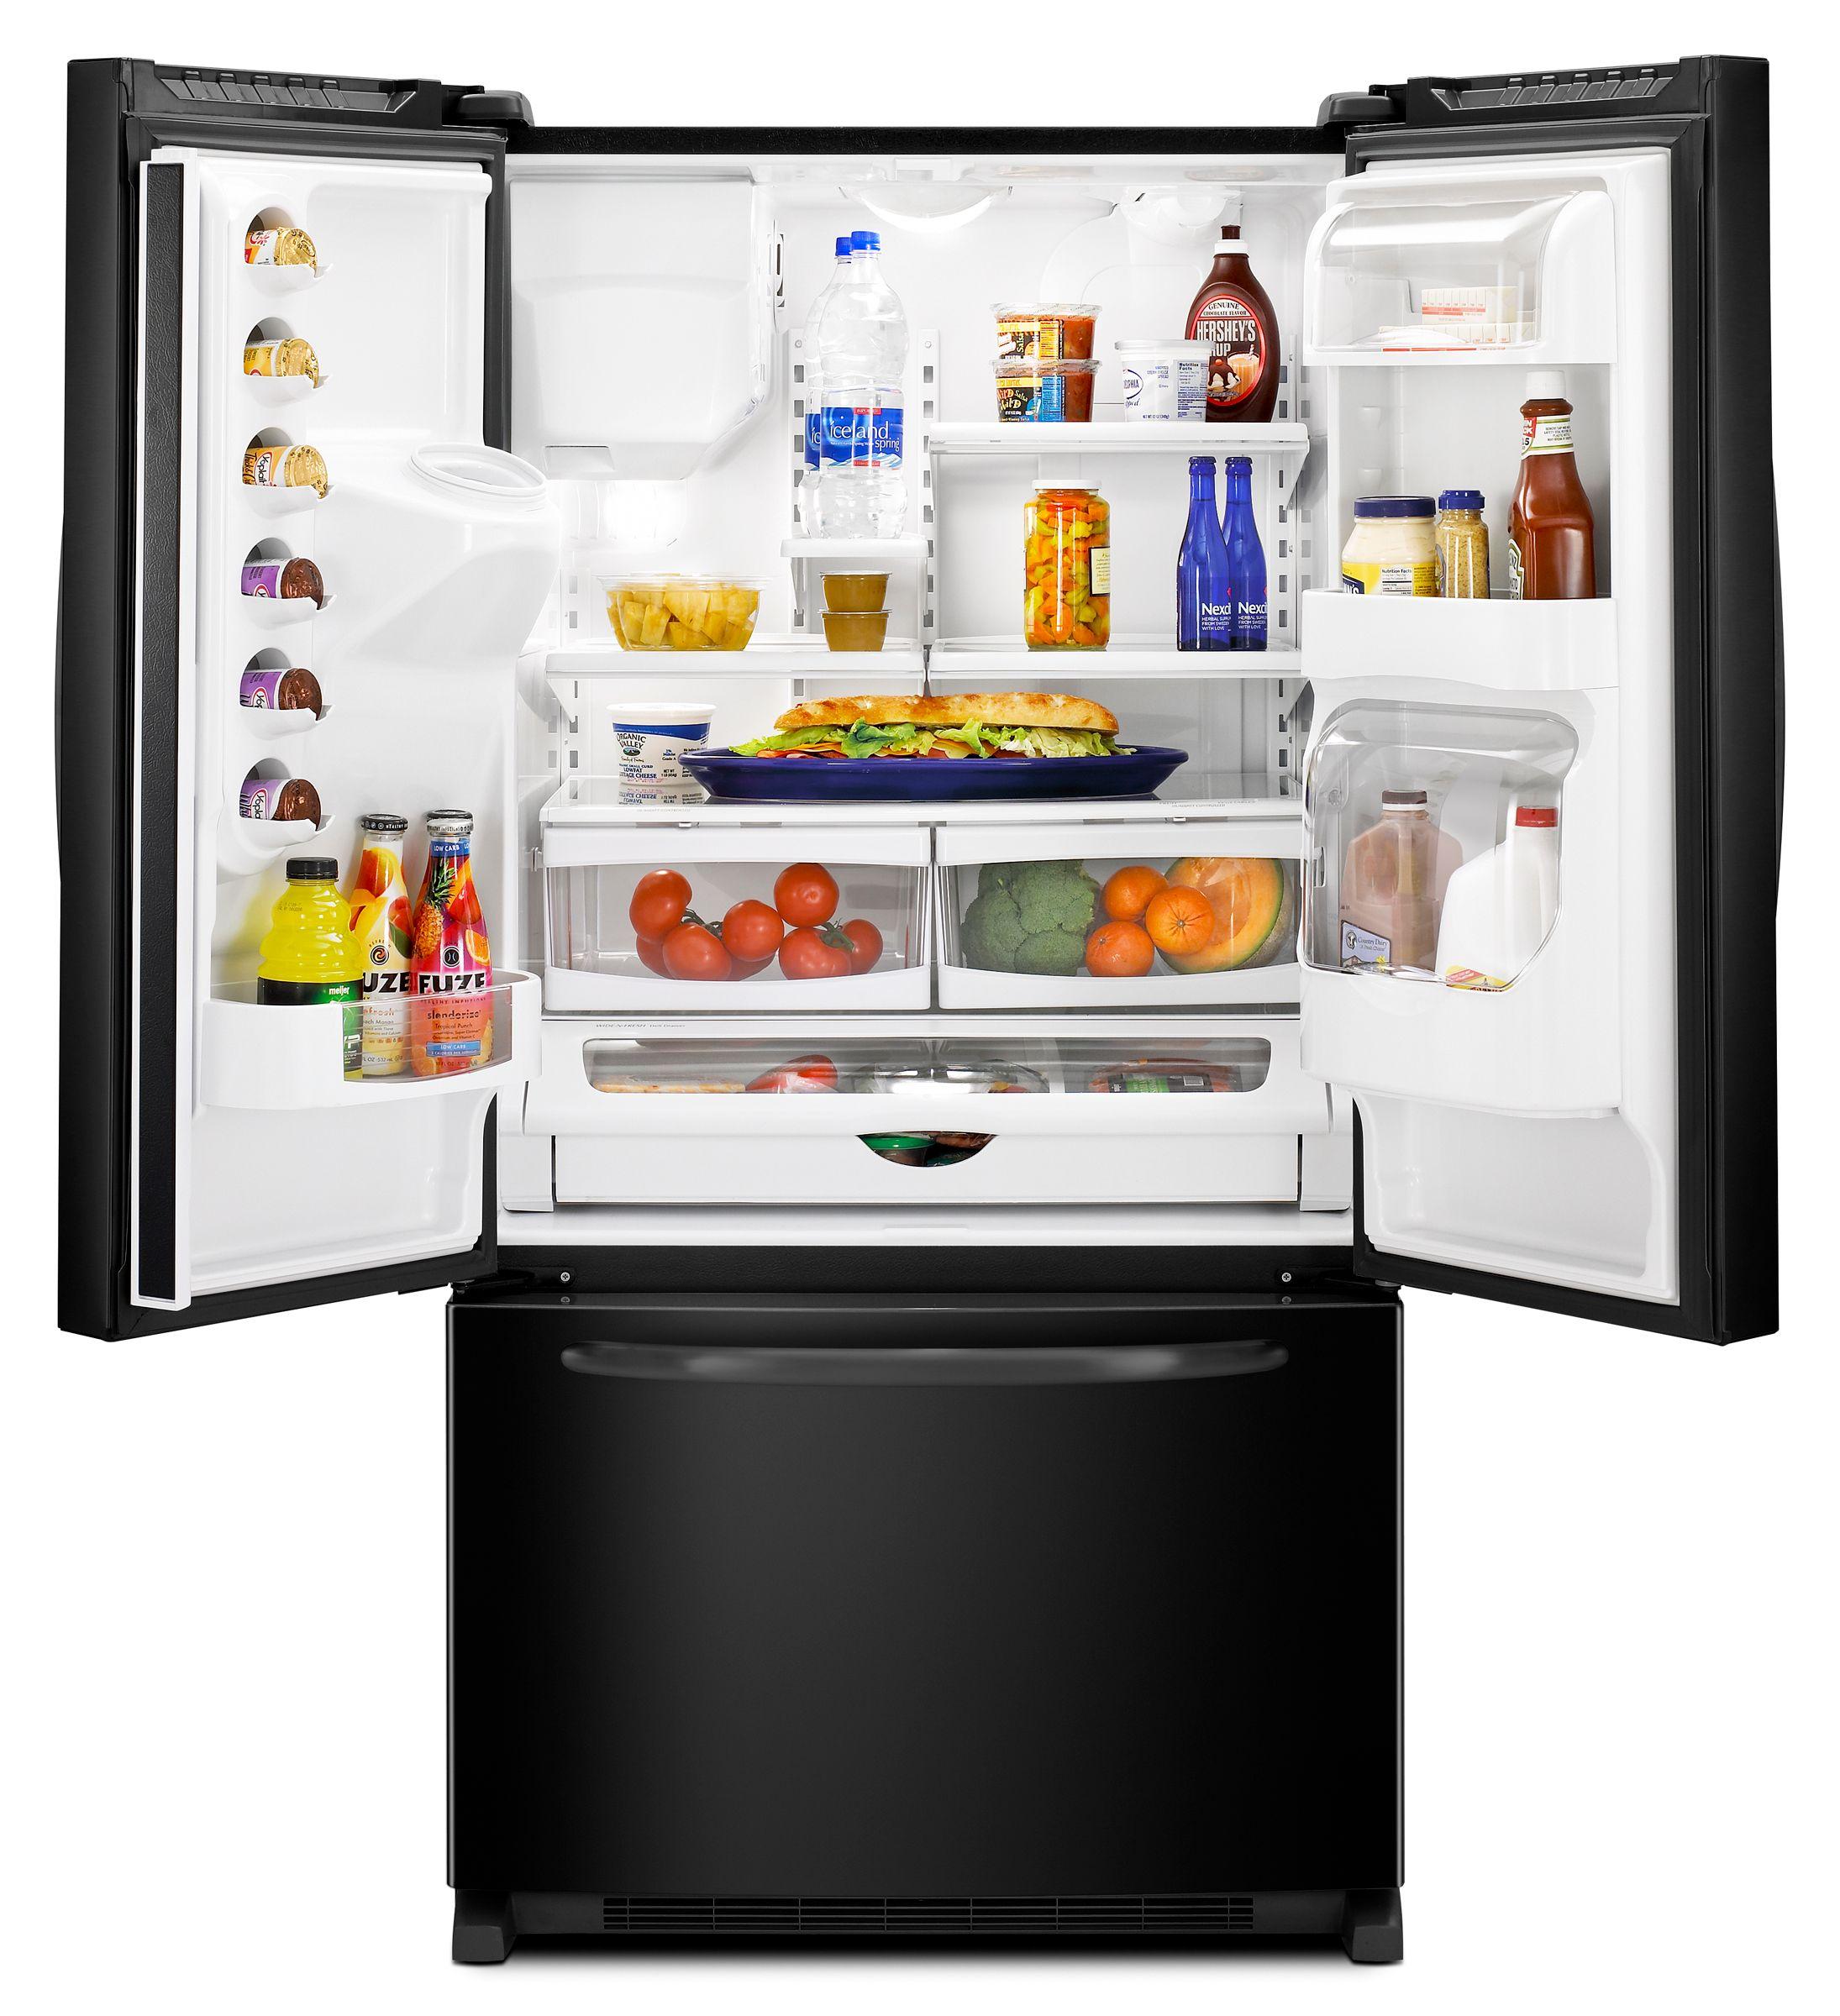 Maytag 24.9 cu. ft. French-Door Refrigerator w/  Ice & Water Dispenser (MFI2569)